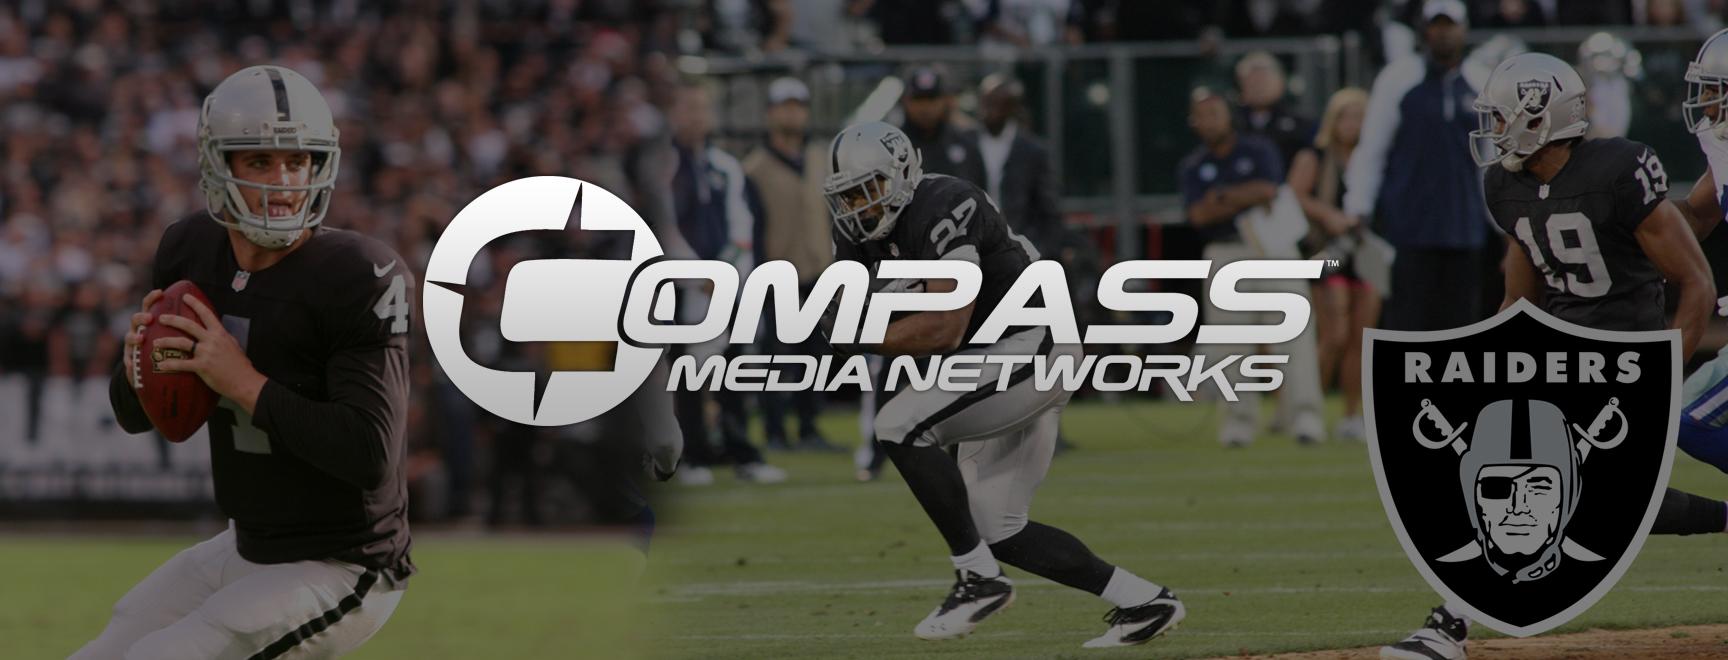 SportsPageHeaderraiders